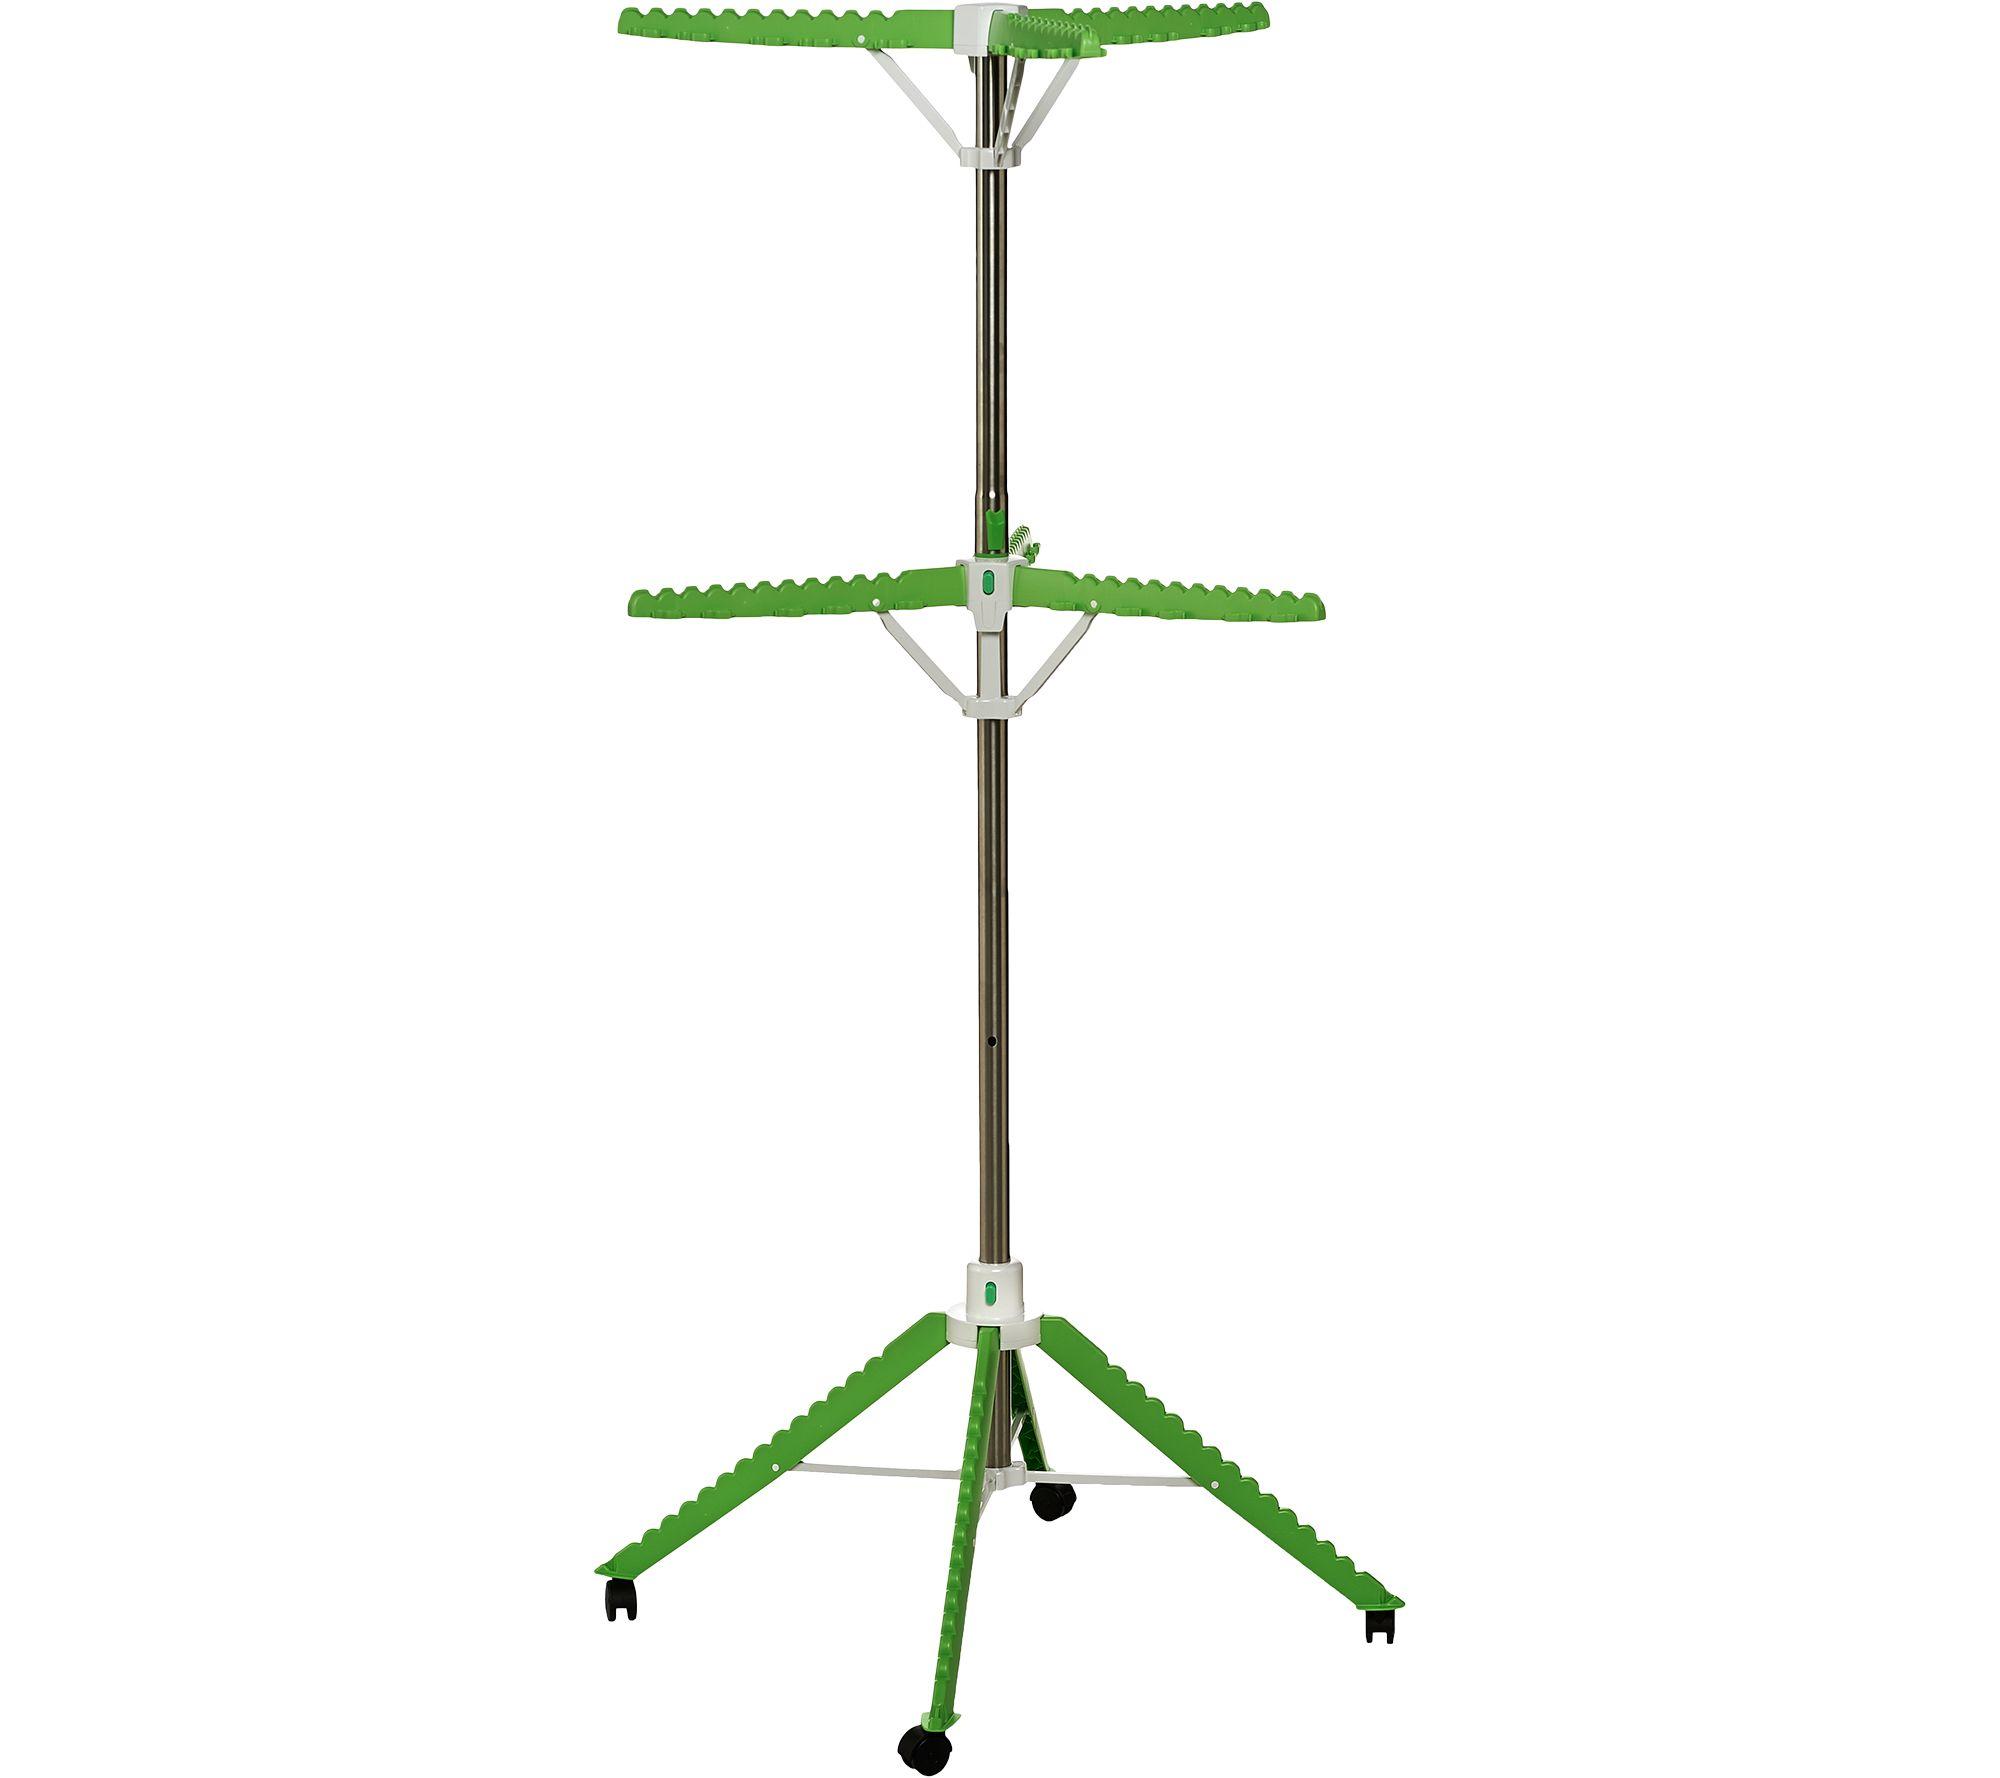 The Green Tree Foldable Heavy Duty Drying U0026 Storage Rack   Page 1 U2014 QVC.com